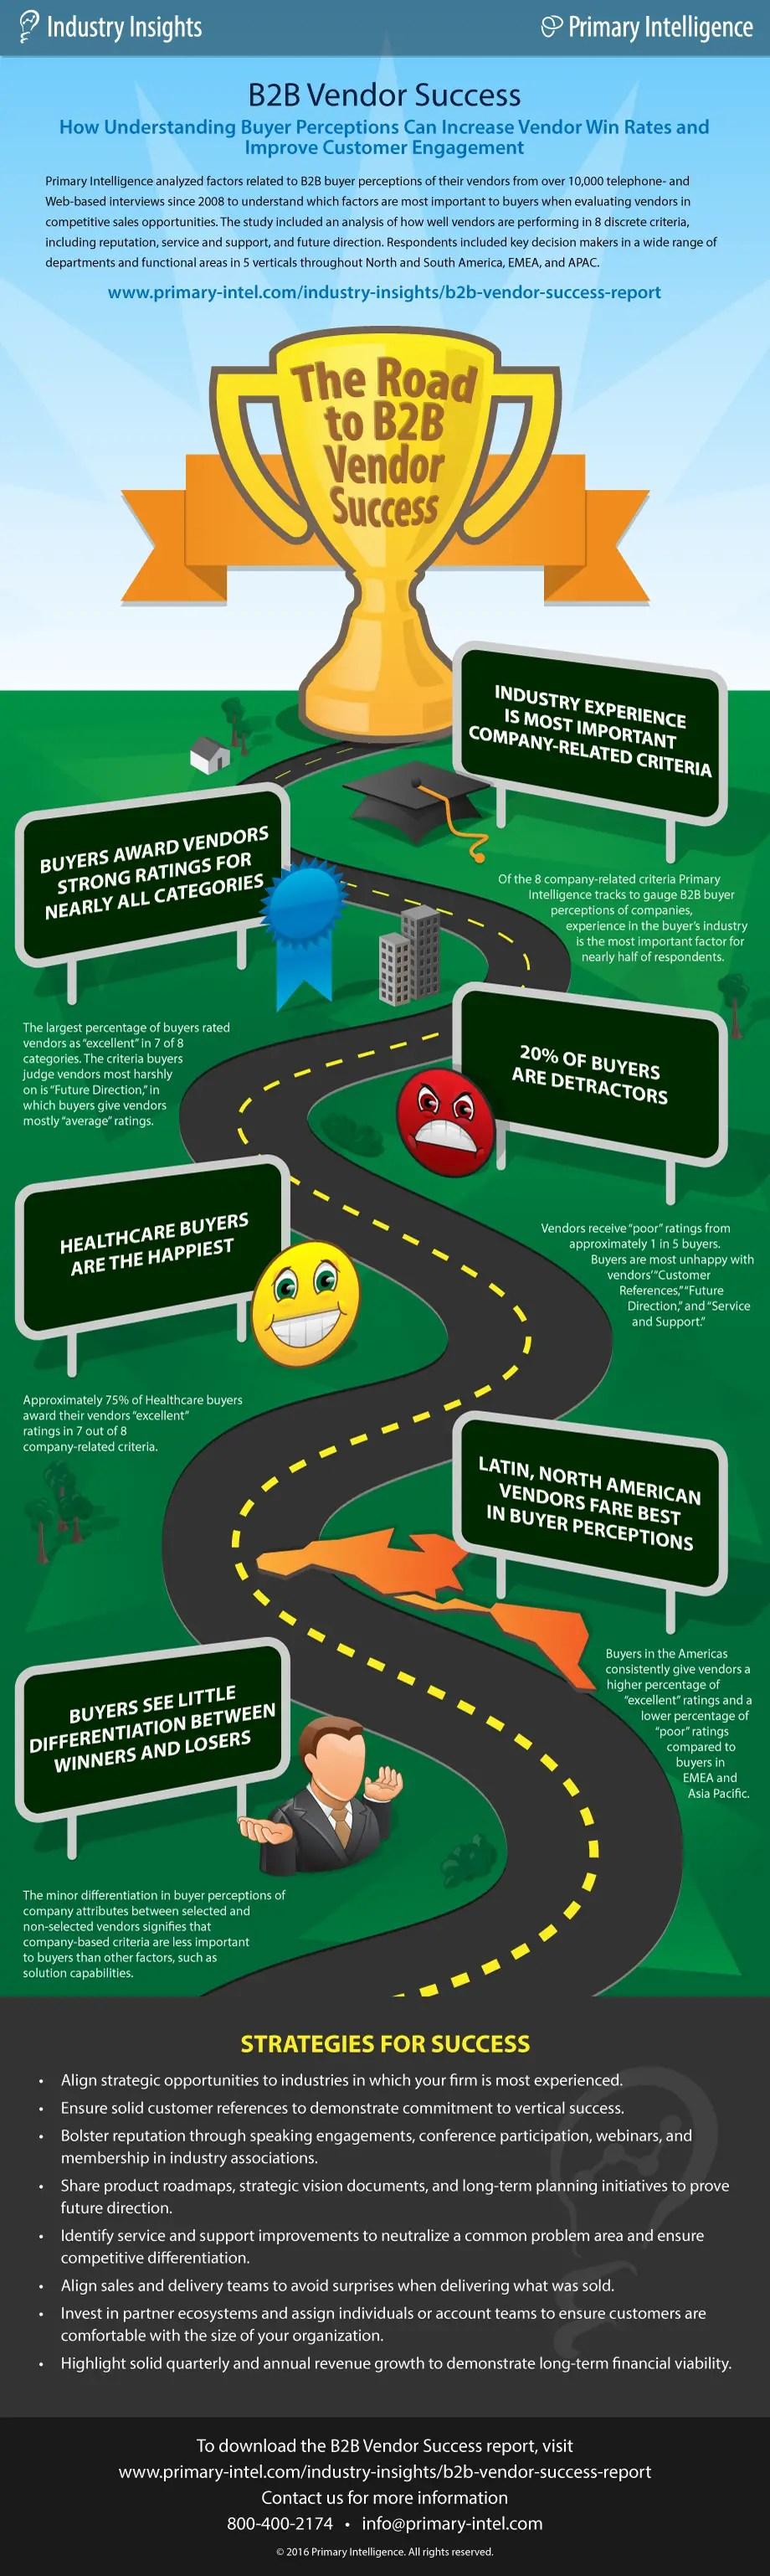 B2B-Vendor-Success-Infographic